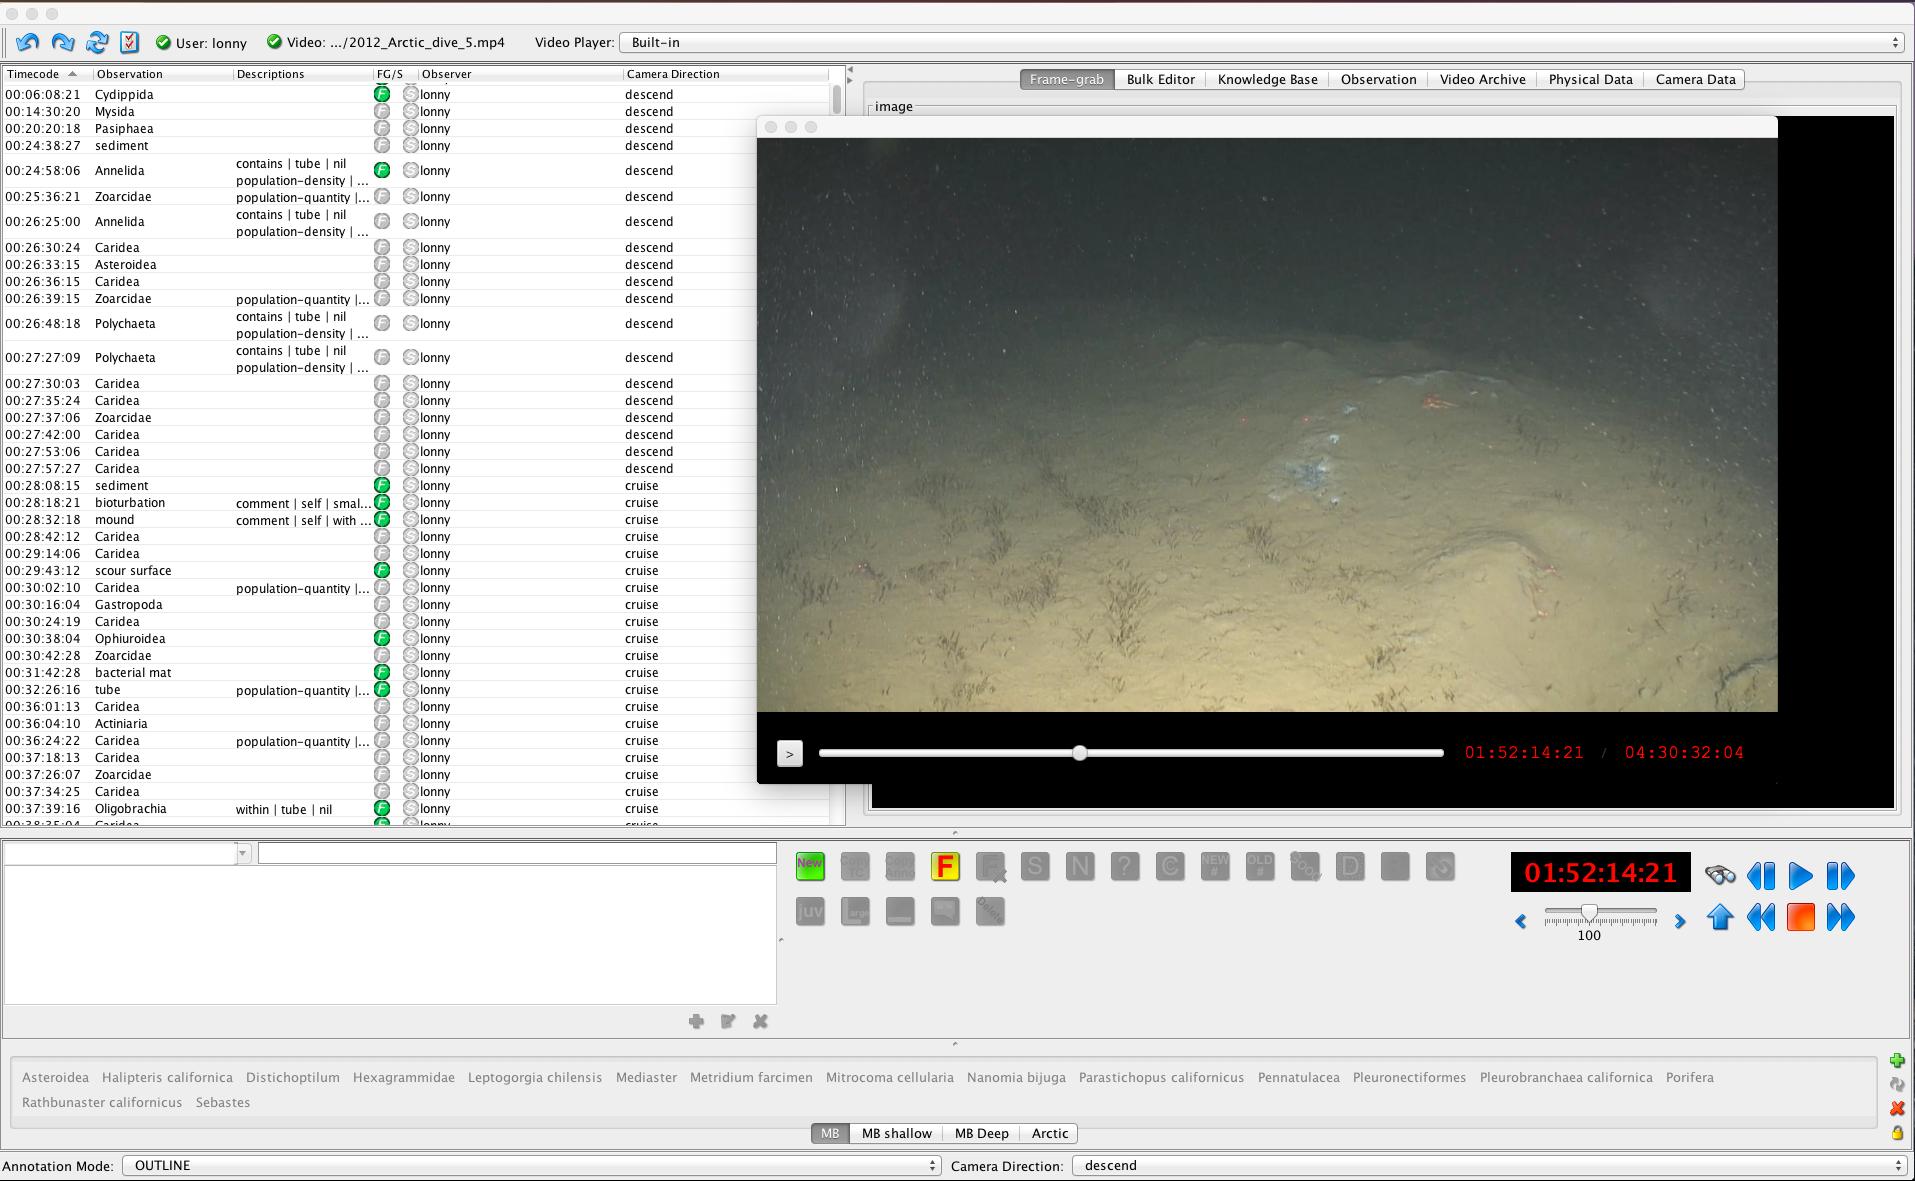 vars_annotation_video_files